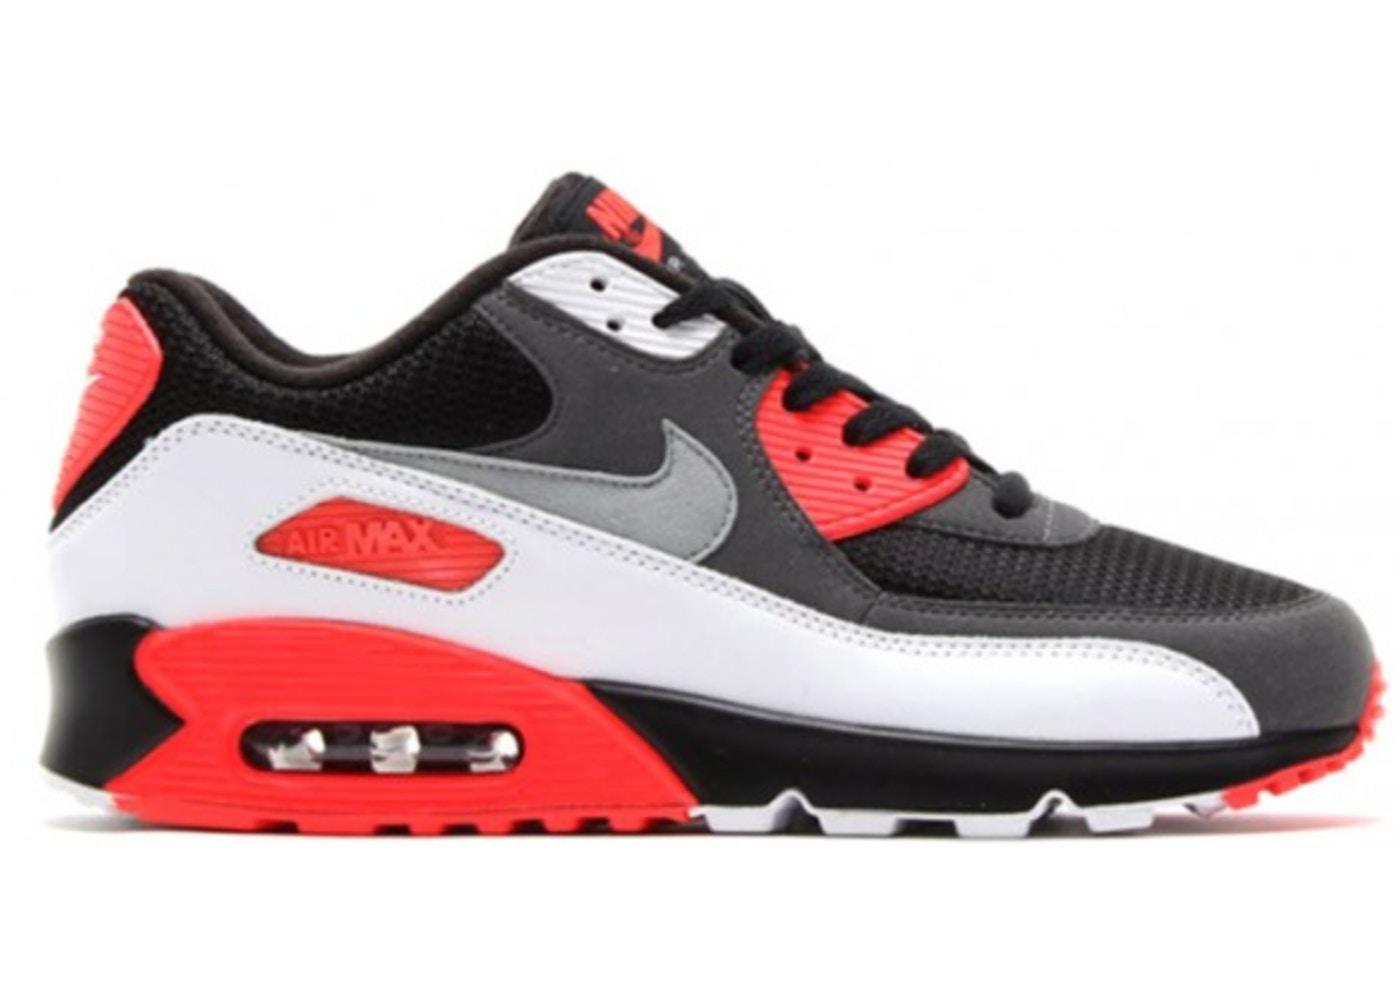 Nike Air Max 90 Essential Black / Red